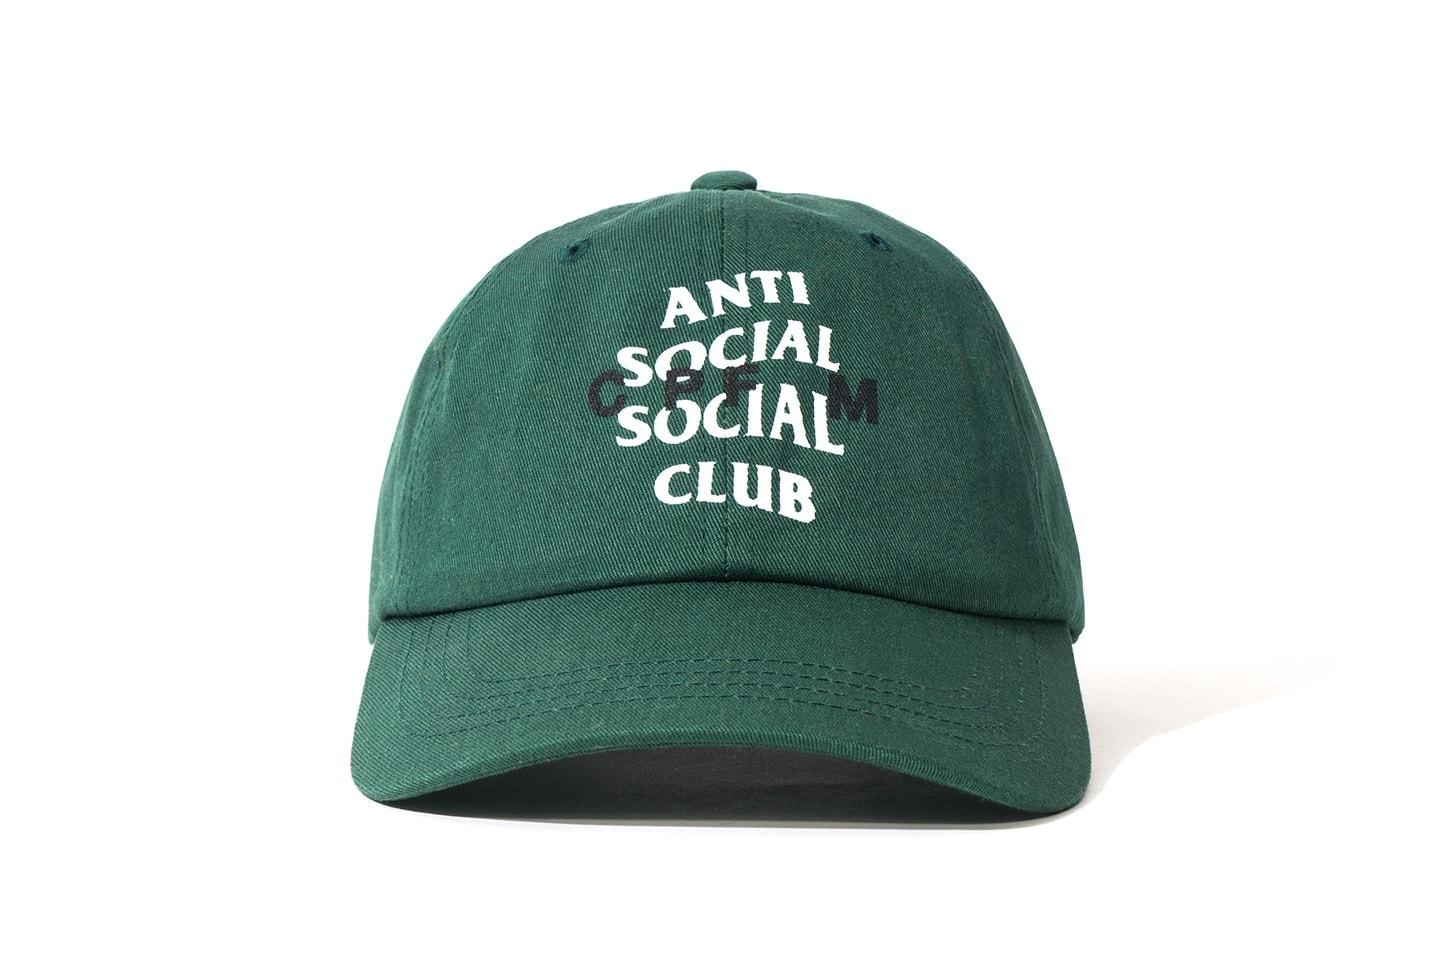 Vetements A COLD WALL BAPE Anti Social Social Club